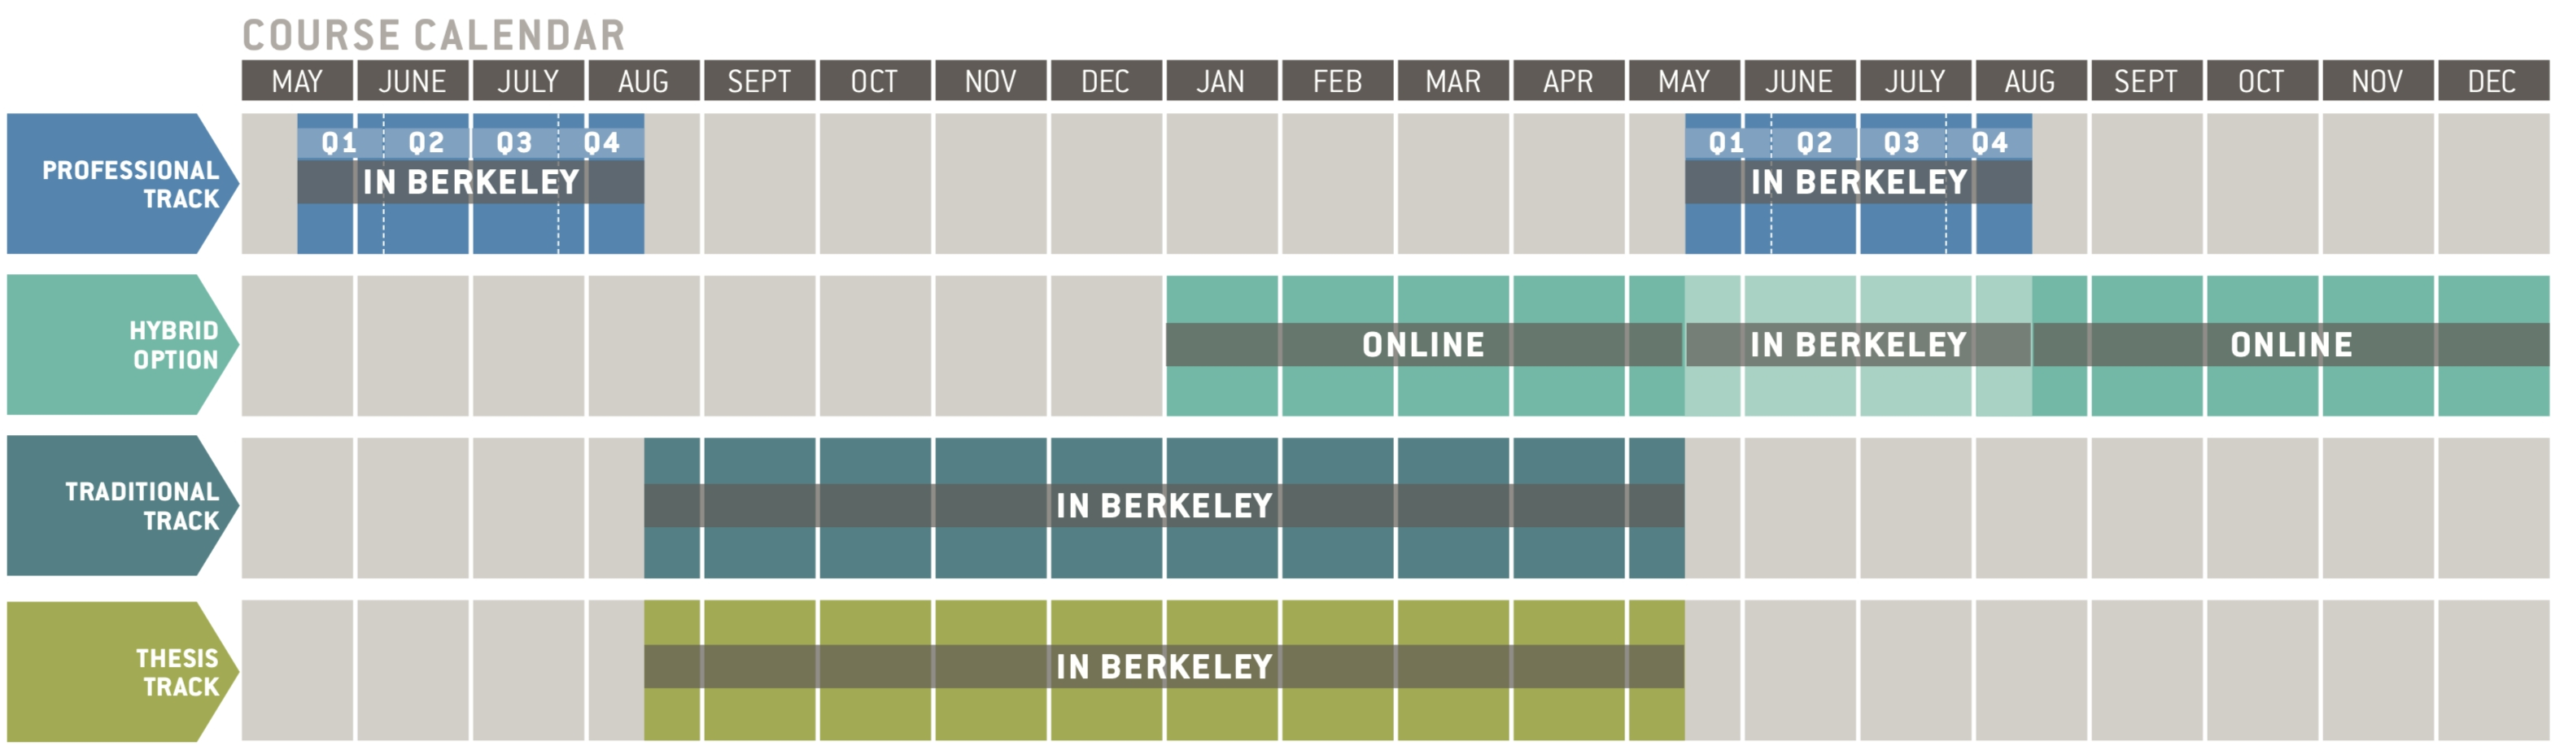 Landing Ll.m. Hybrid Option   Berkeley Law Uc Berkeley regarding Cal Berkeley Academic Calendar